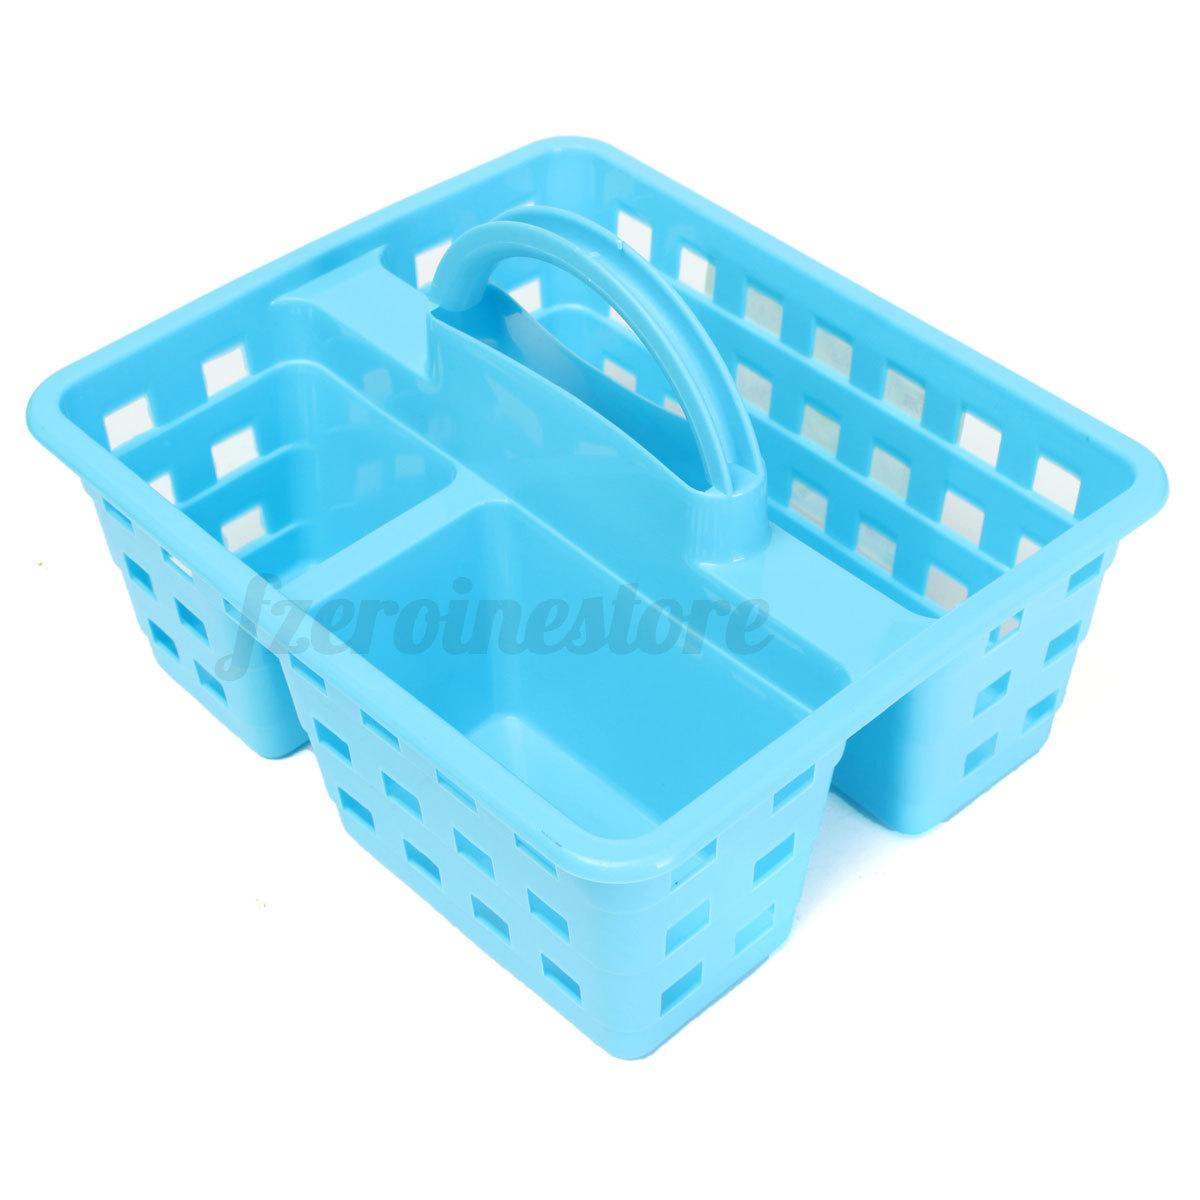 PRO Plastic Storage Basket & Handle Cleaning Caddy Bathroom Kitchen ...